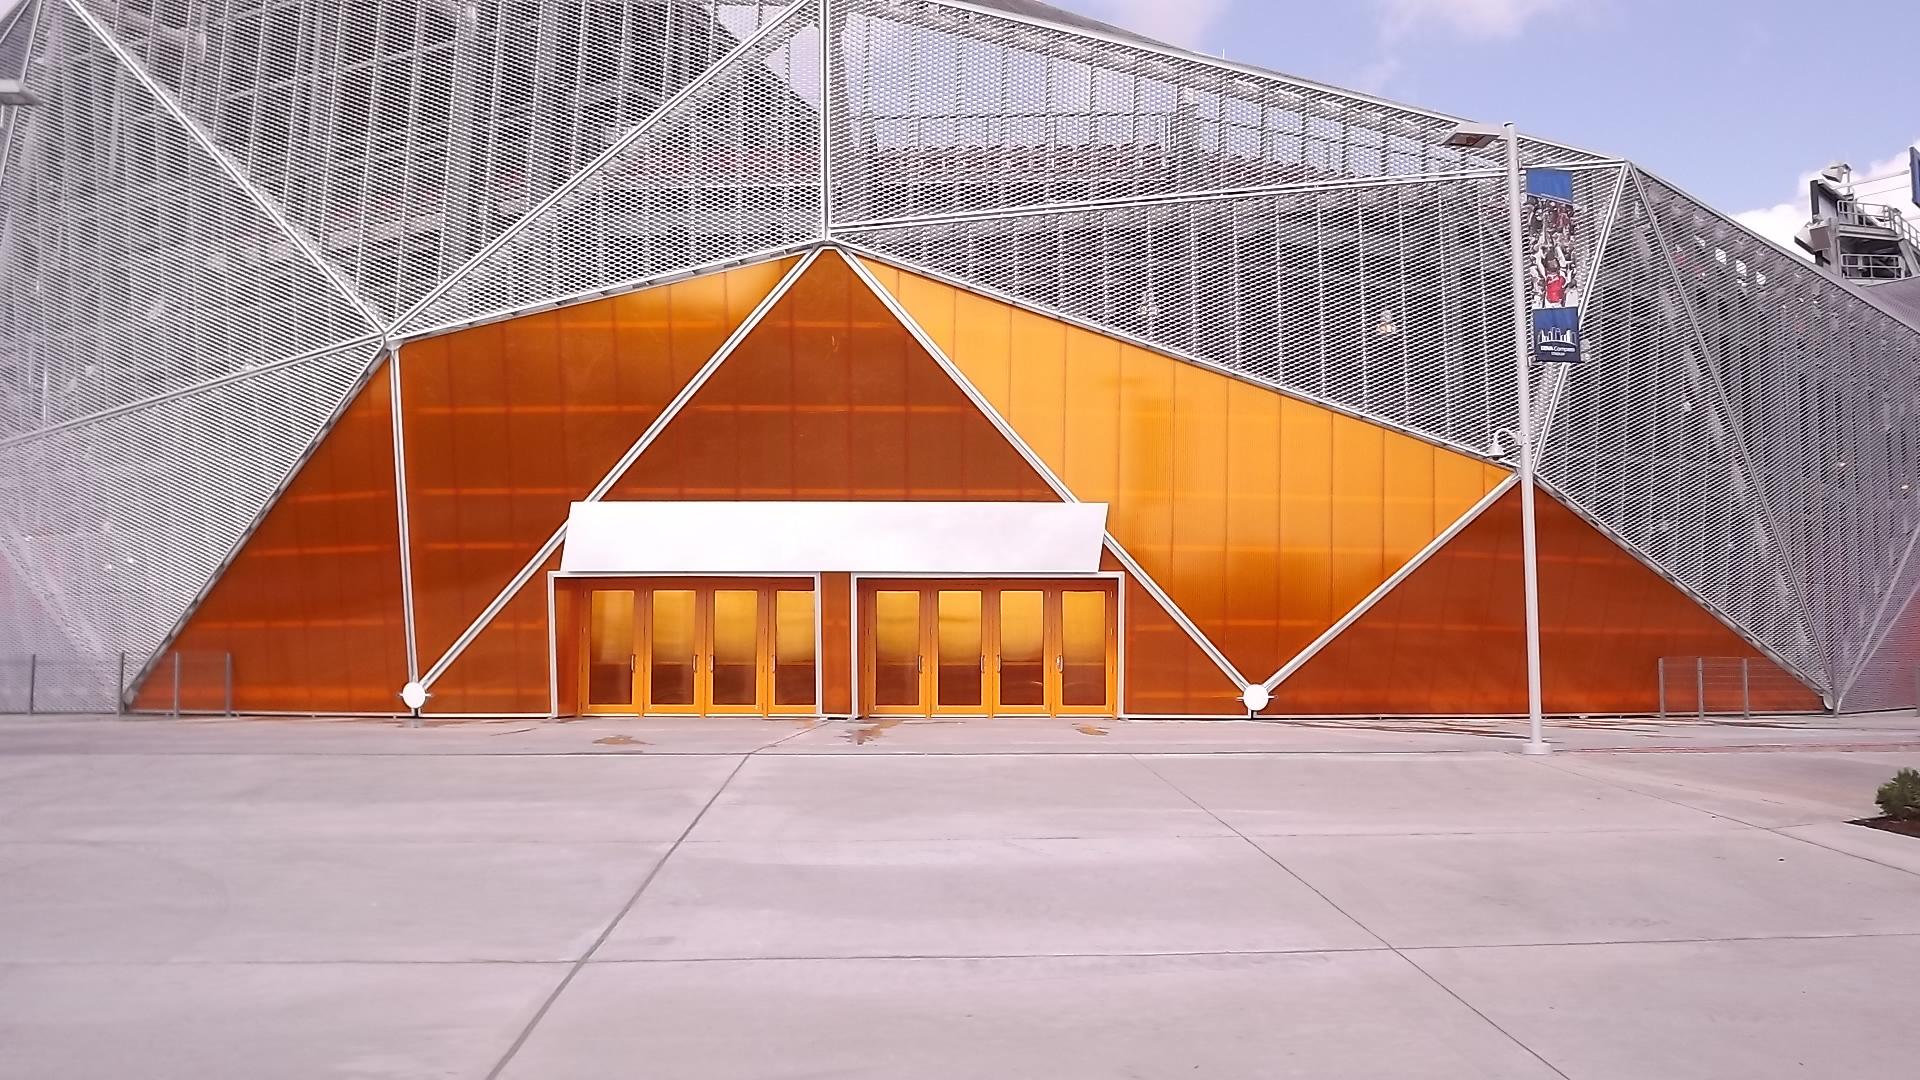 Houston Dynamo Exterior Translucent Polycarbonate Rpc